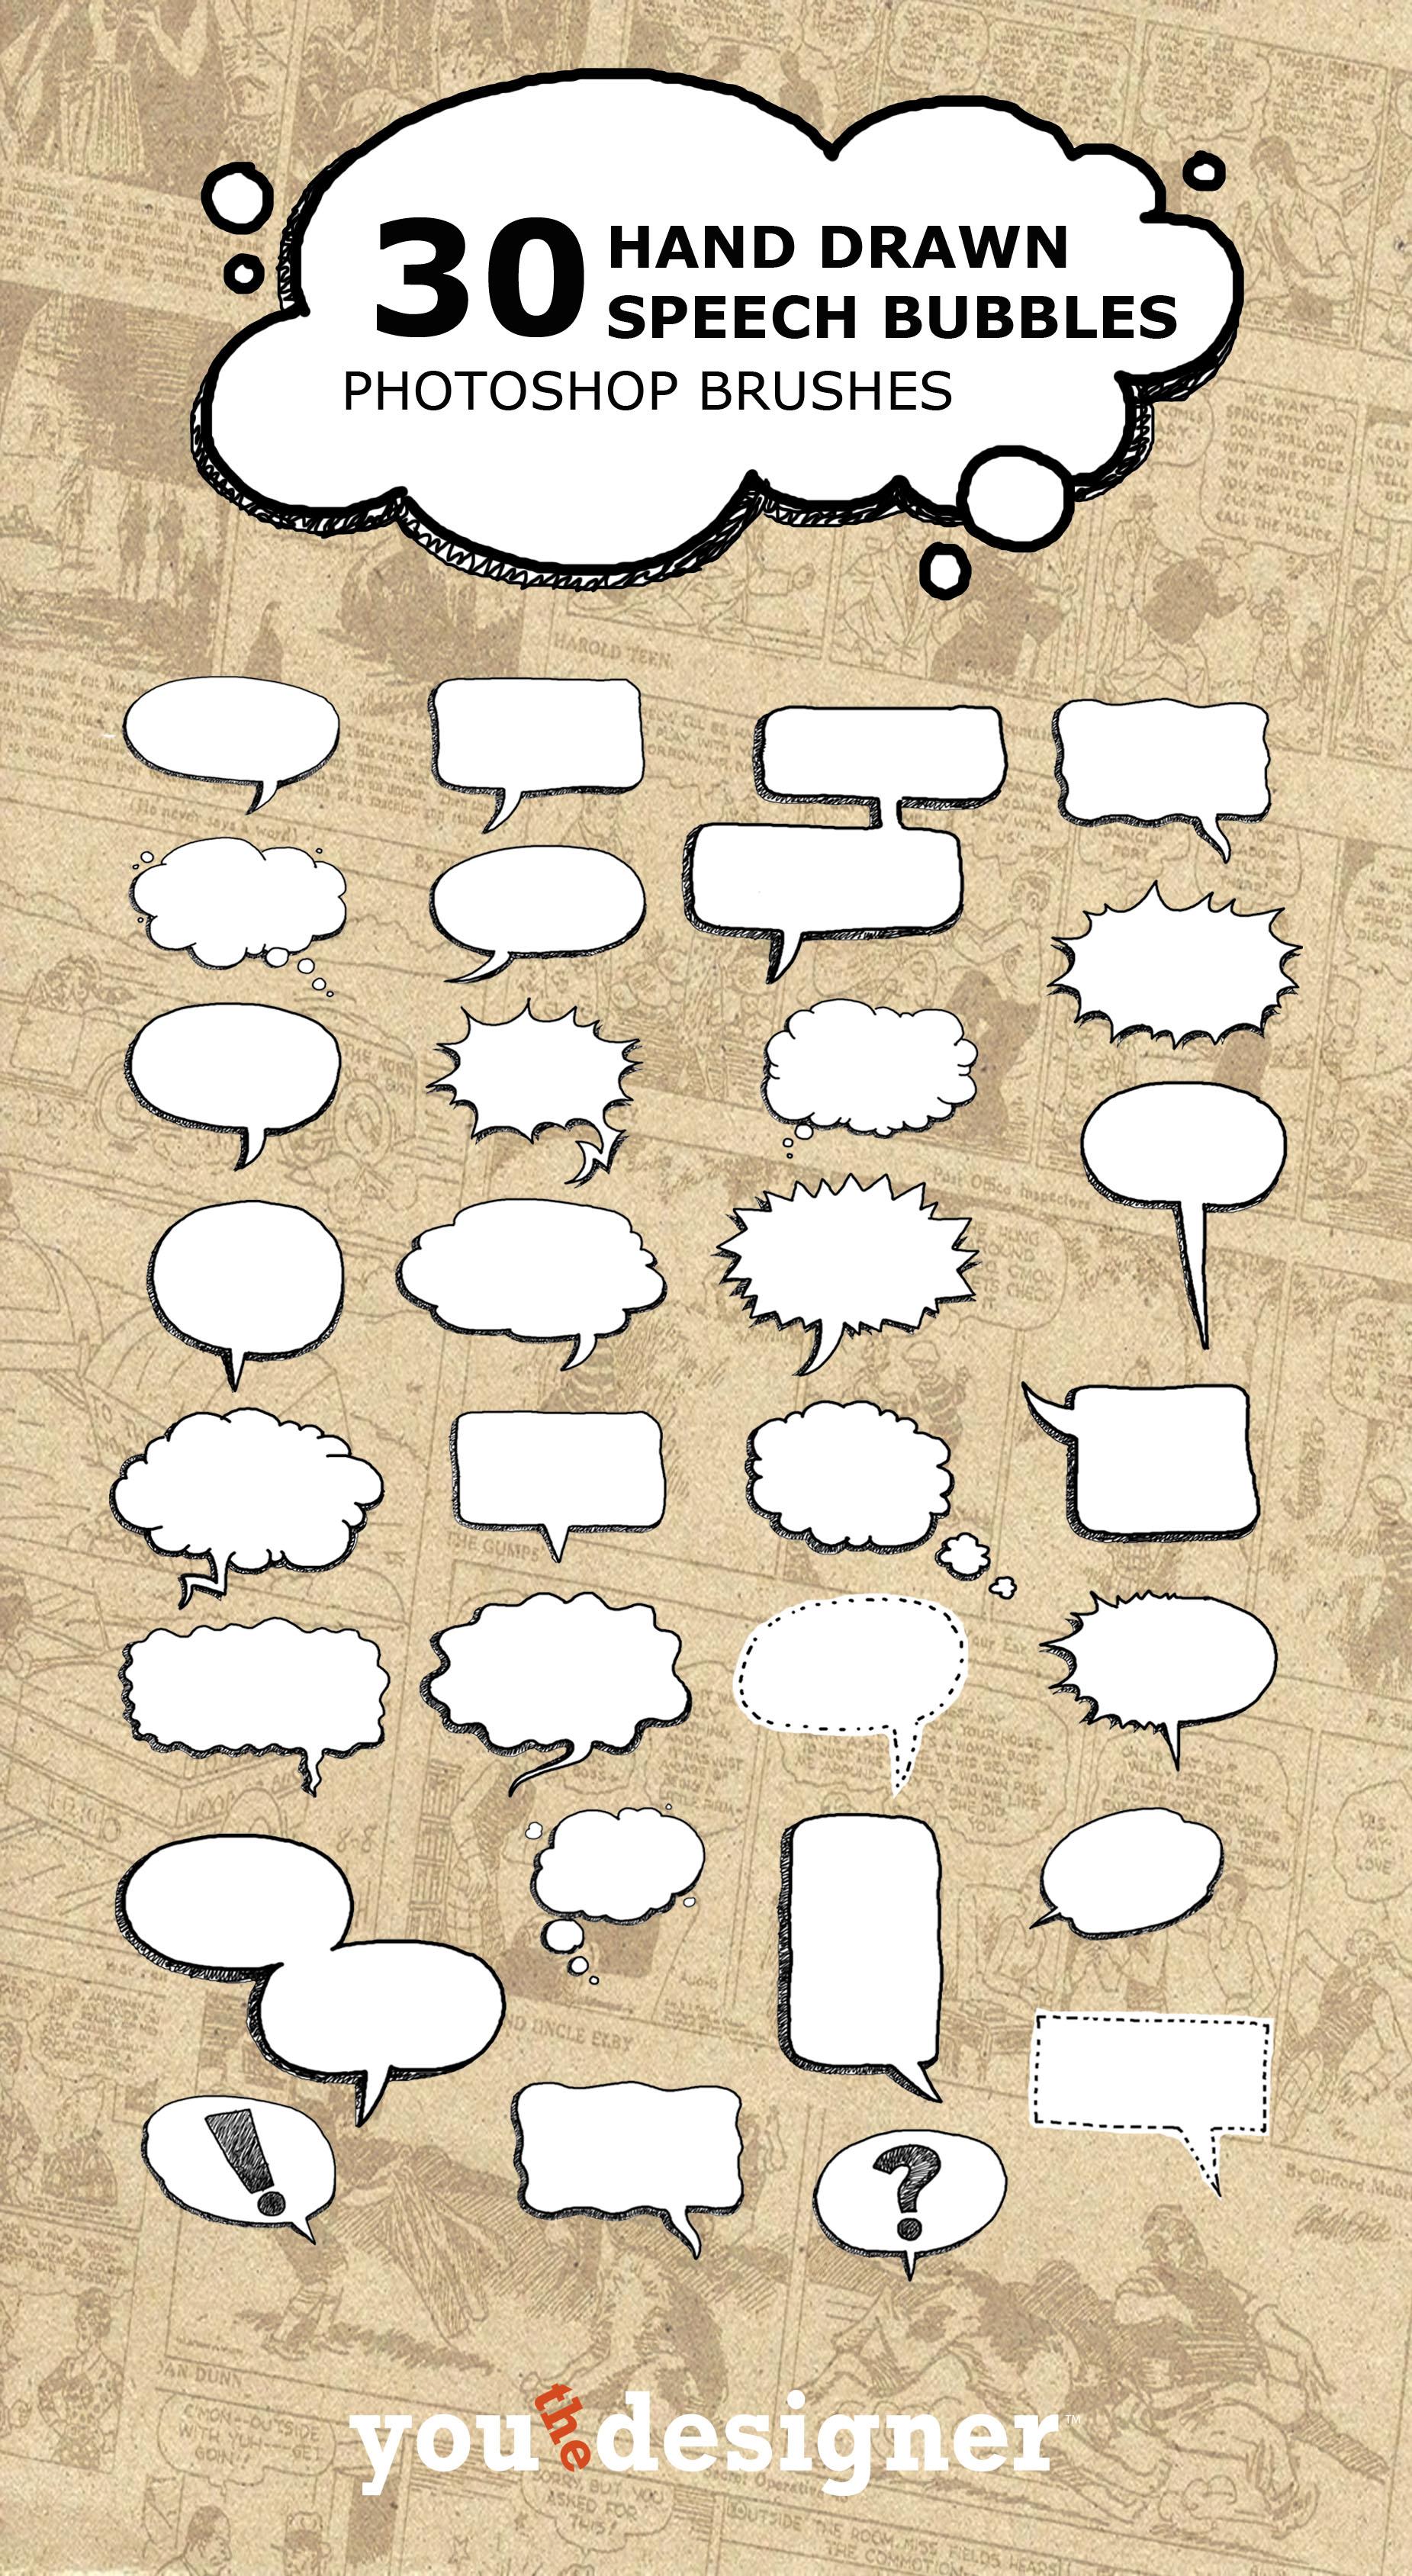 30 Hand Drawn Speech Bubble Photoshop Brushes – UCreative.com